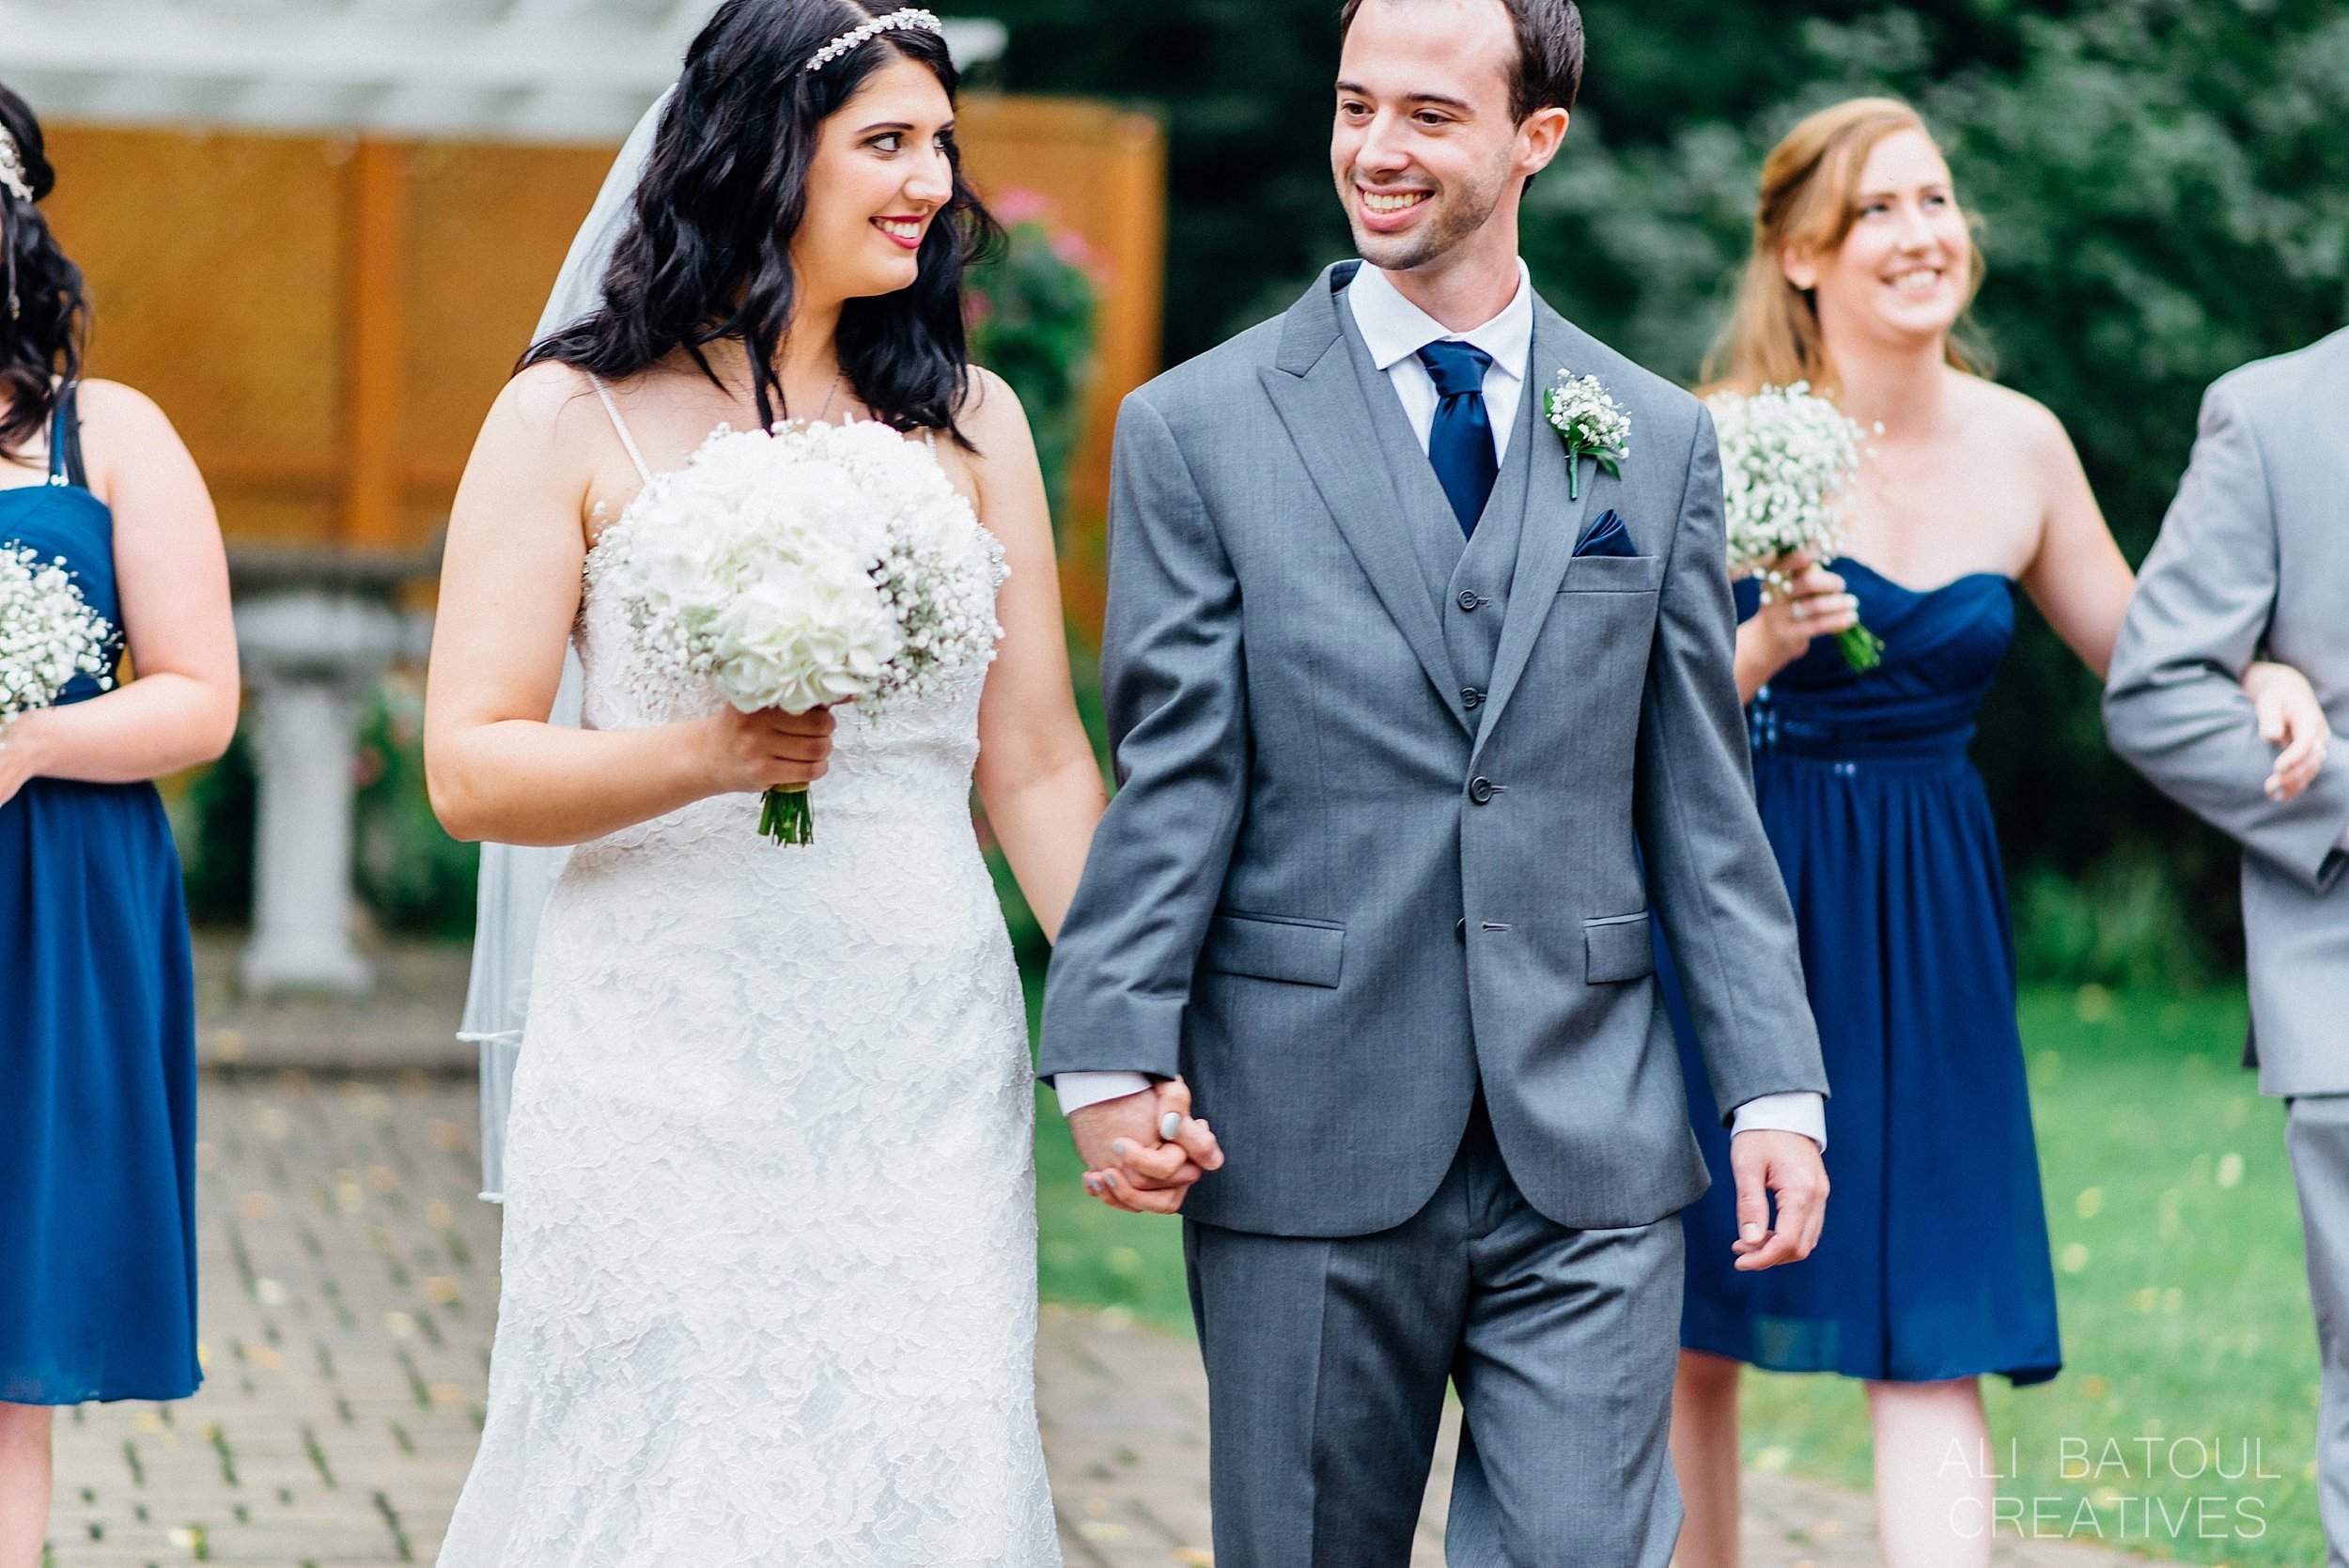 Jocelyn + Steve At The Schoolhouse Wedding - Ali and Batoul Fine Art Wedding Photography_0057.jpg